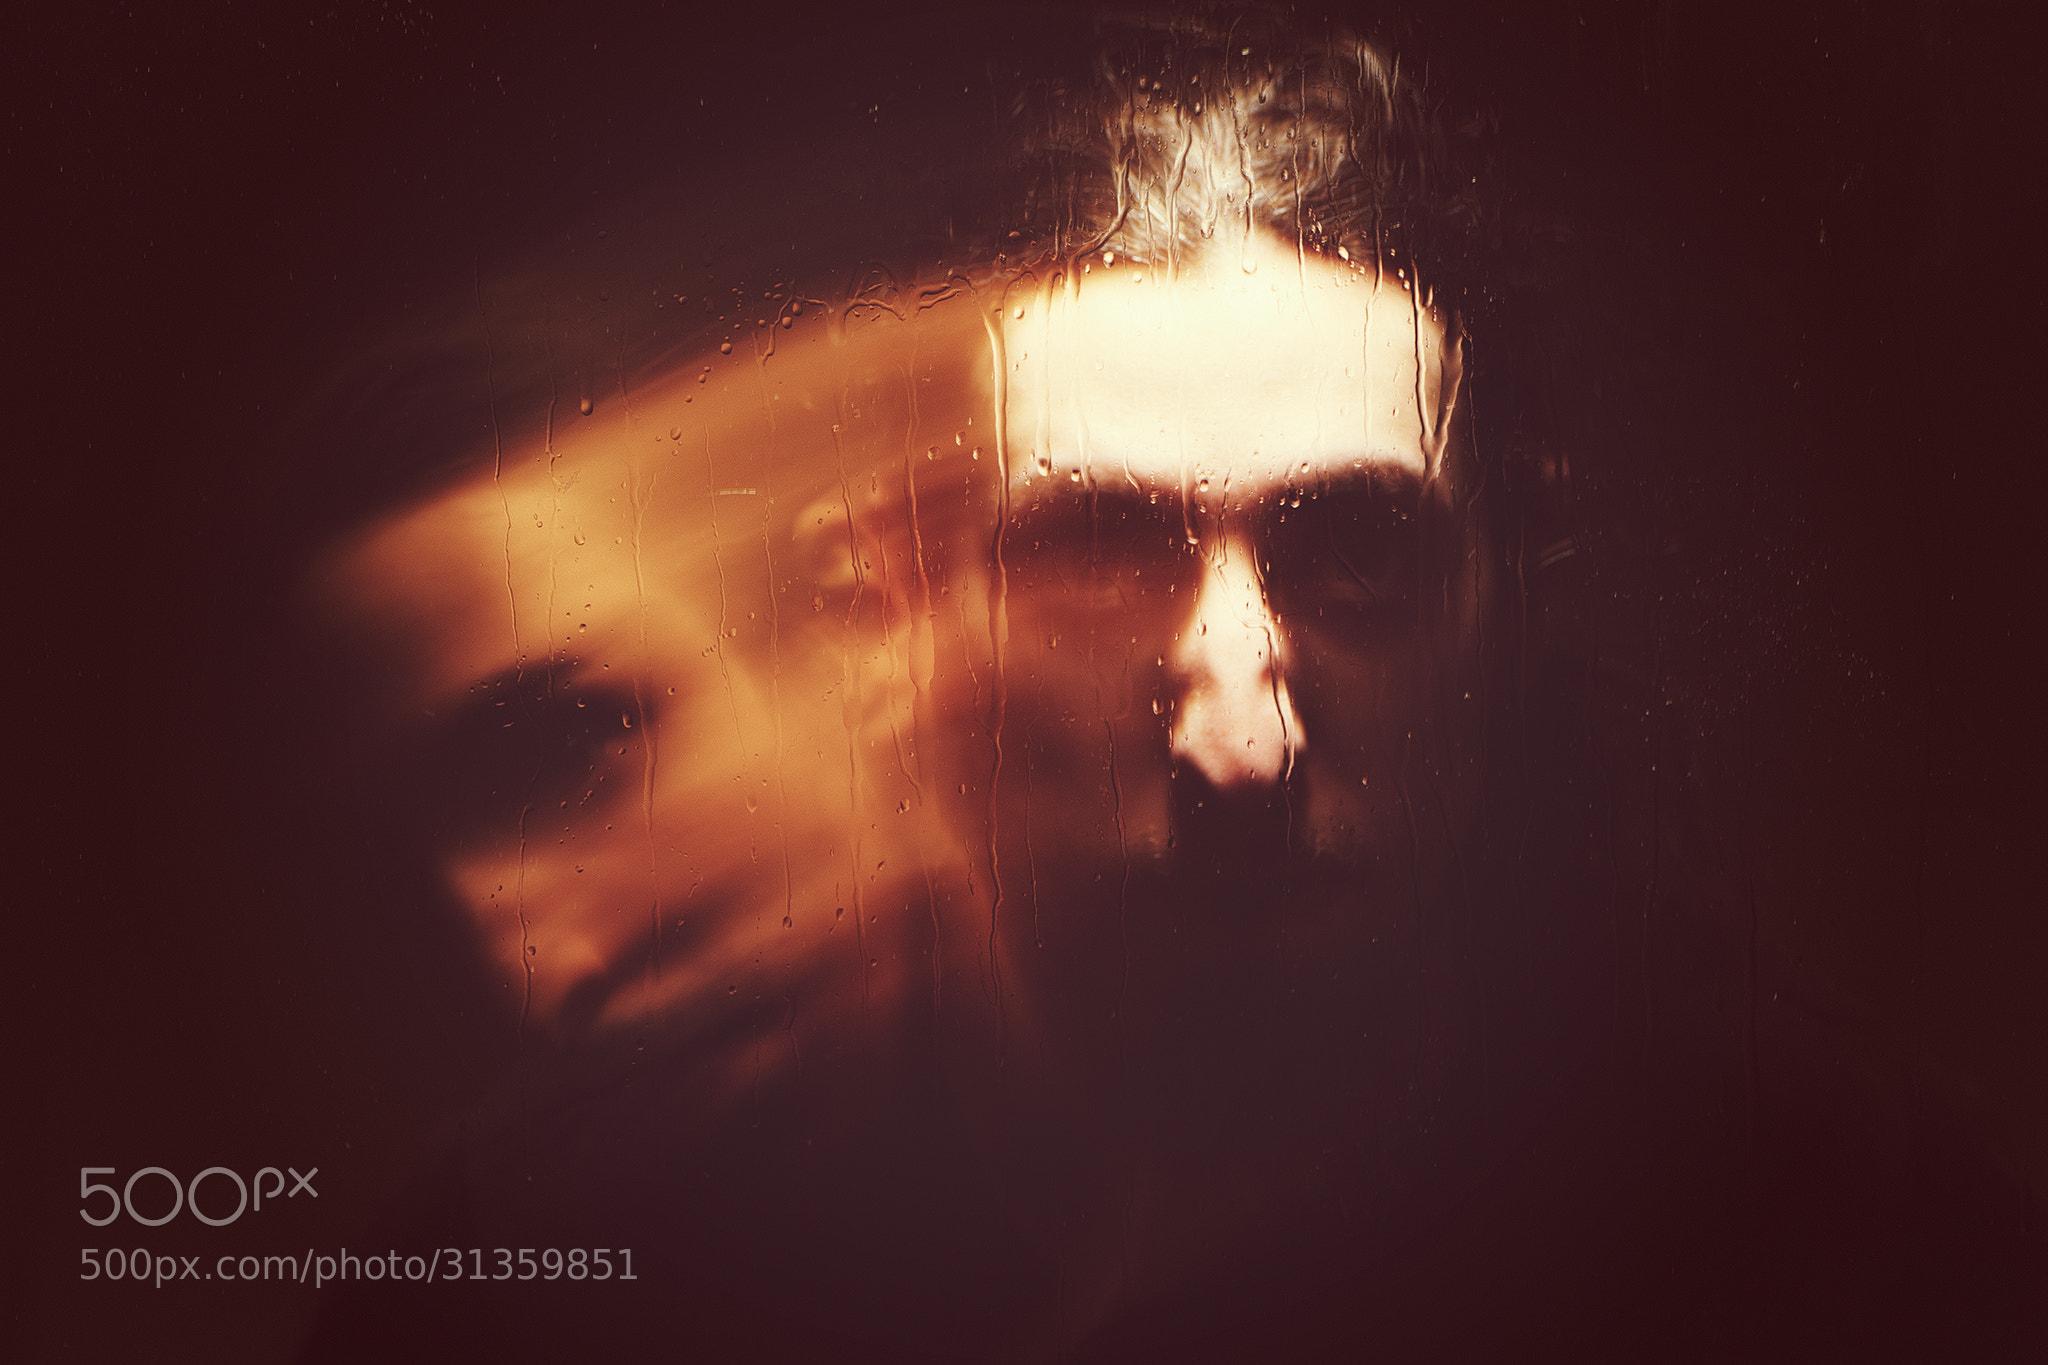 Photograph Psyco by Chris Lambeth on 500px